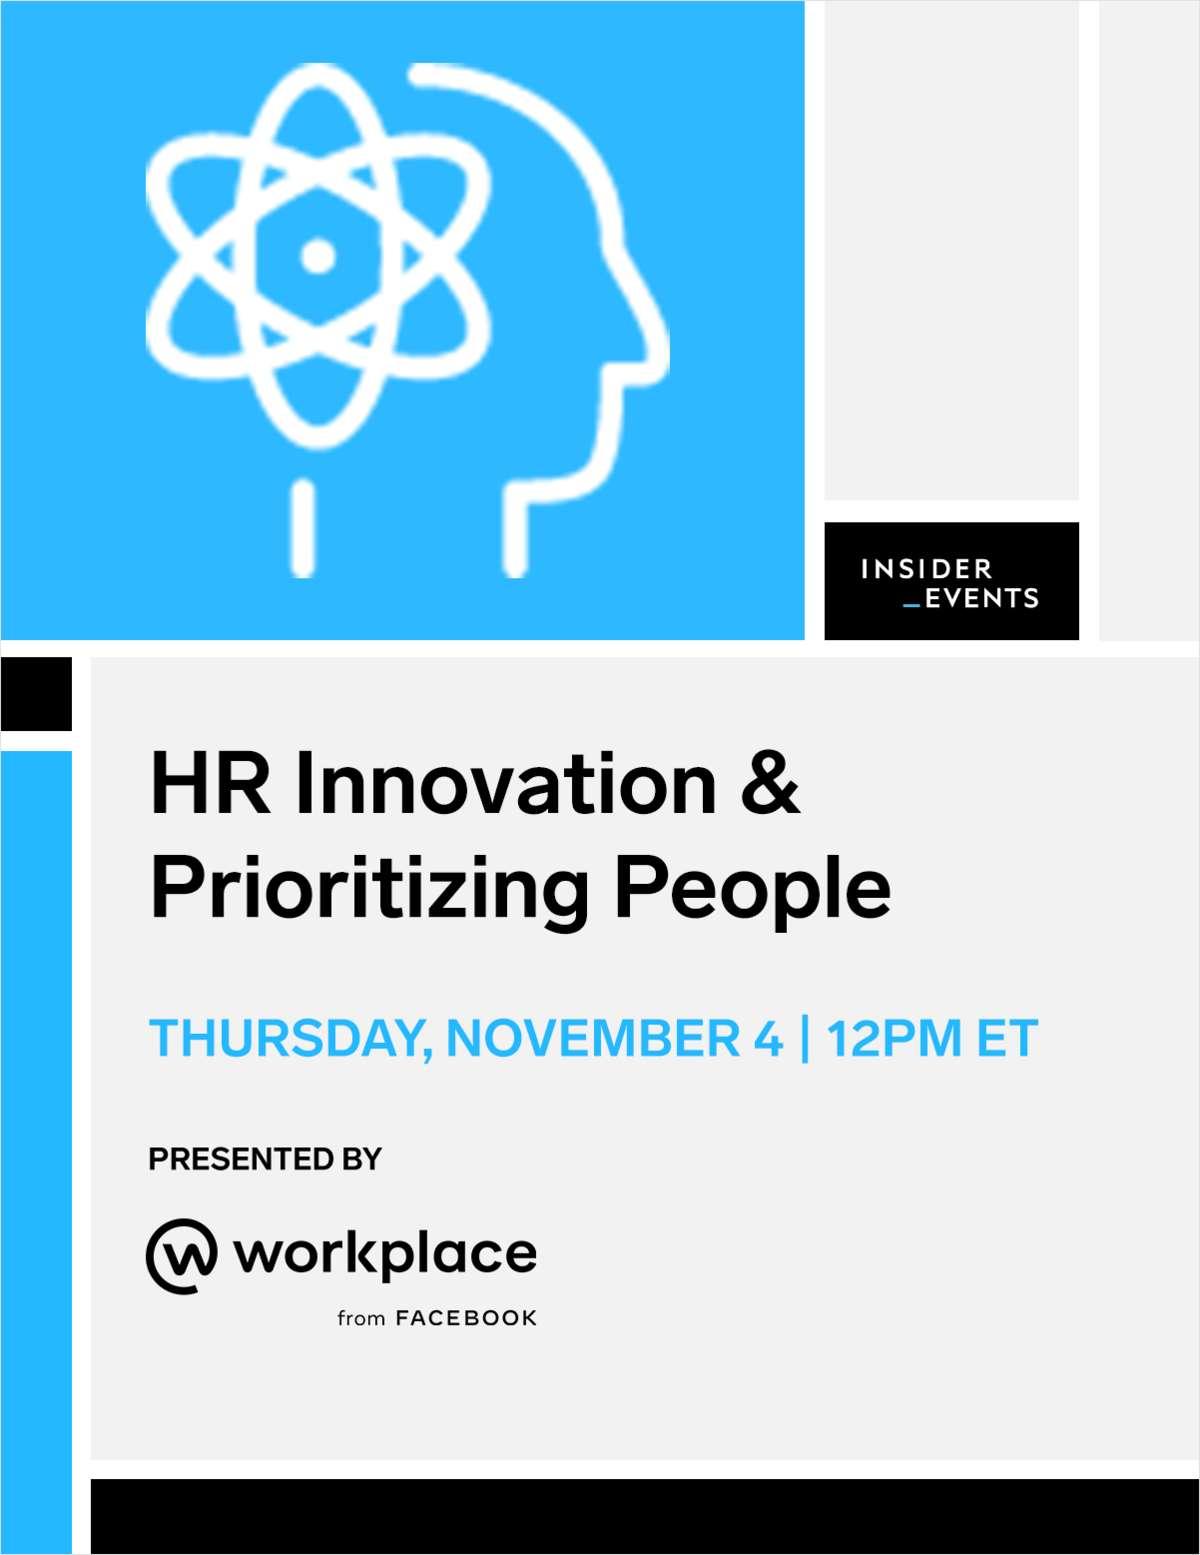 HR Innovation & Prioritizing People